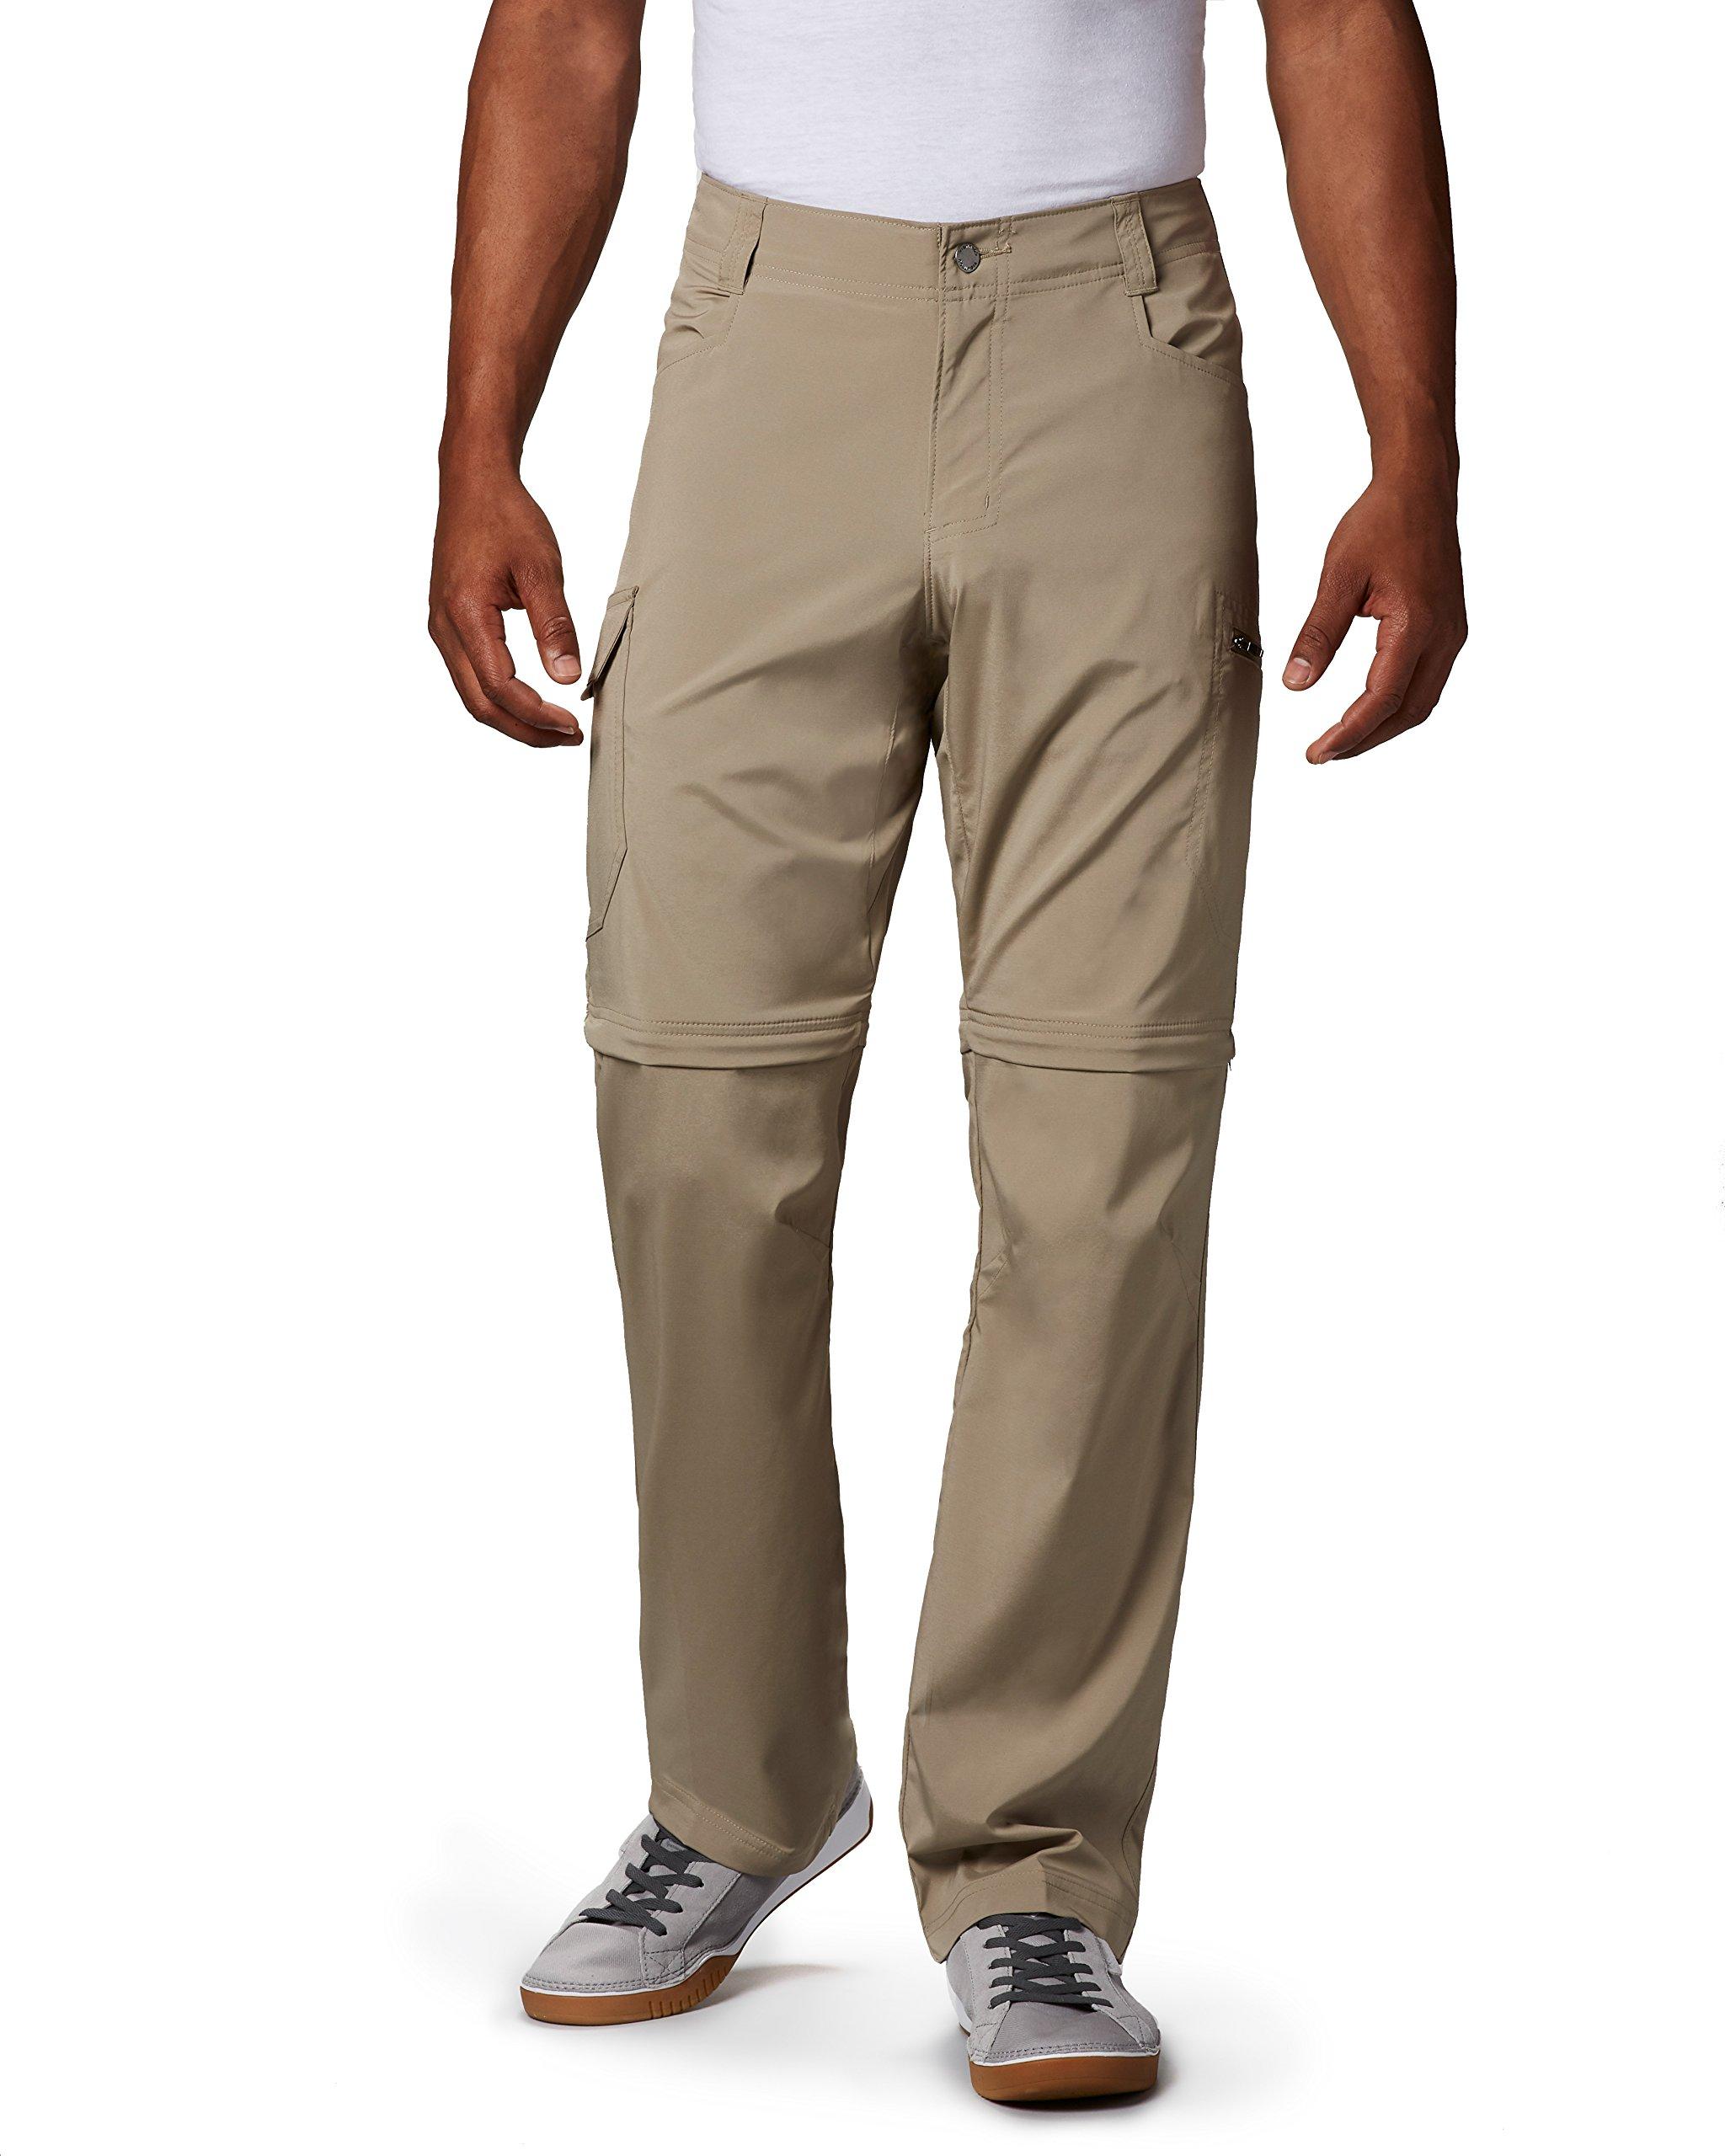 Columbia Men's Silver Ridge Stretch Convertible Pants, Tusk, 34 x 30